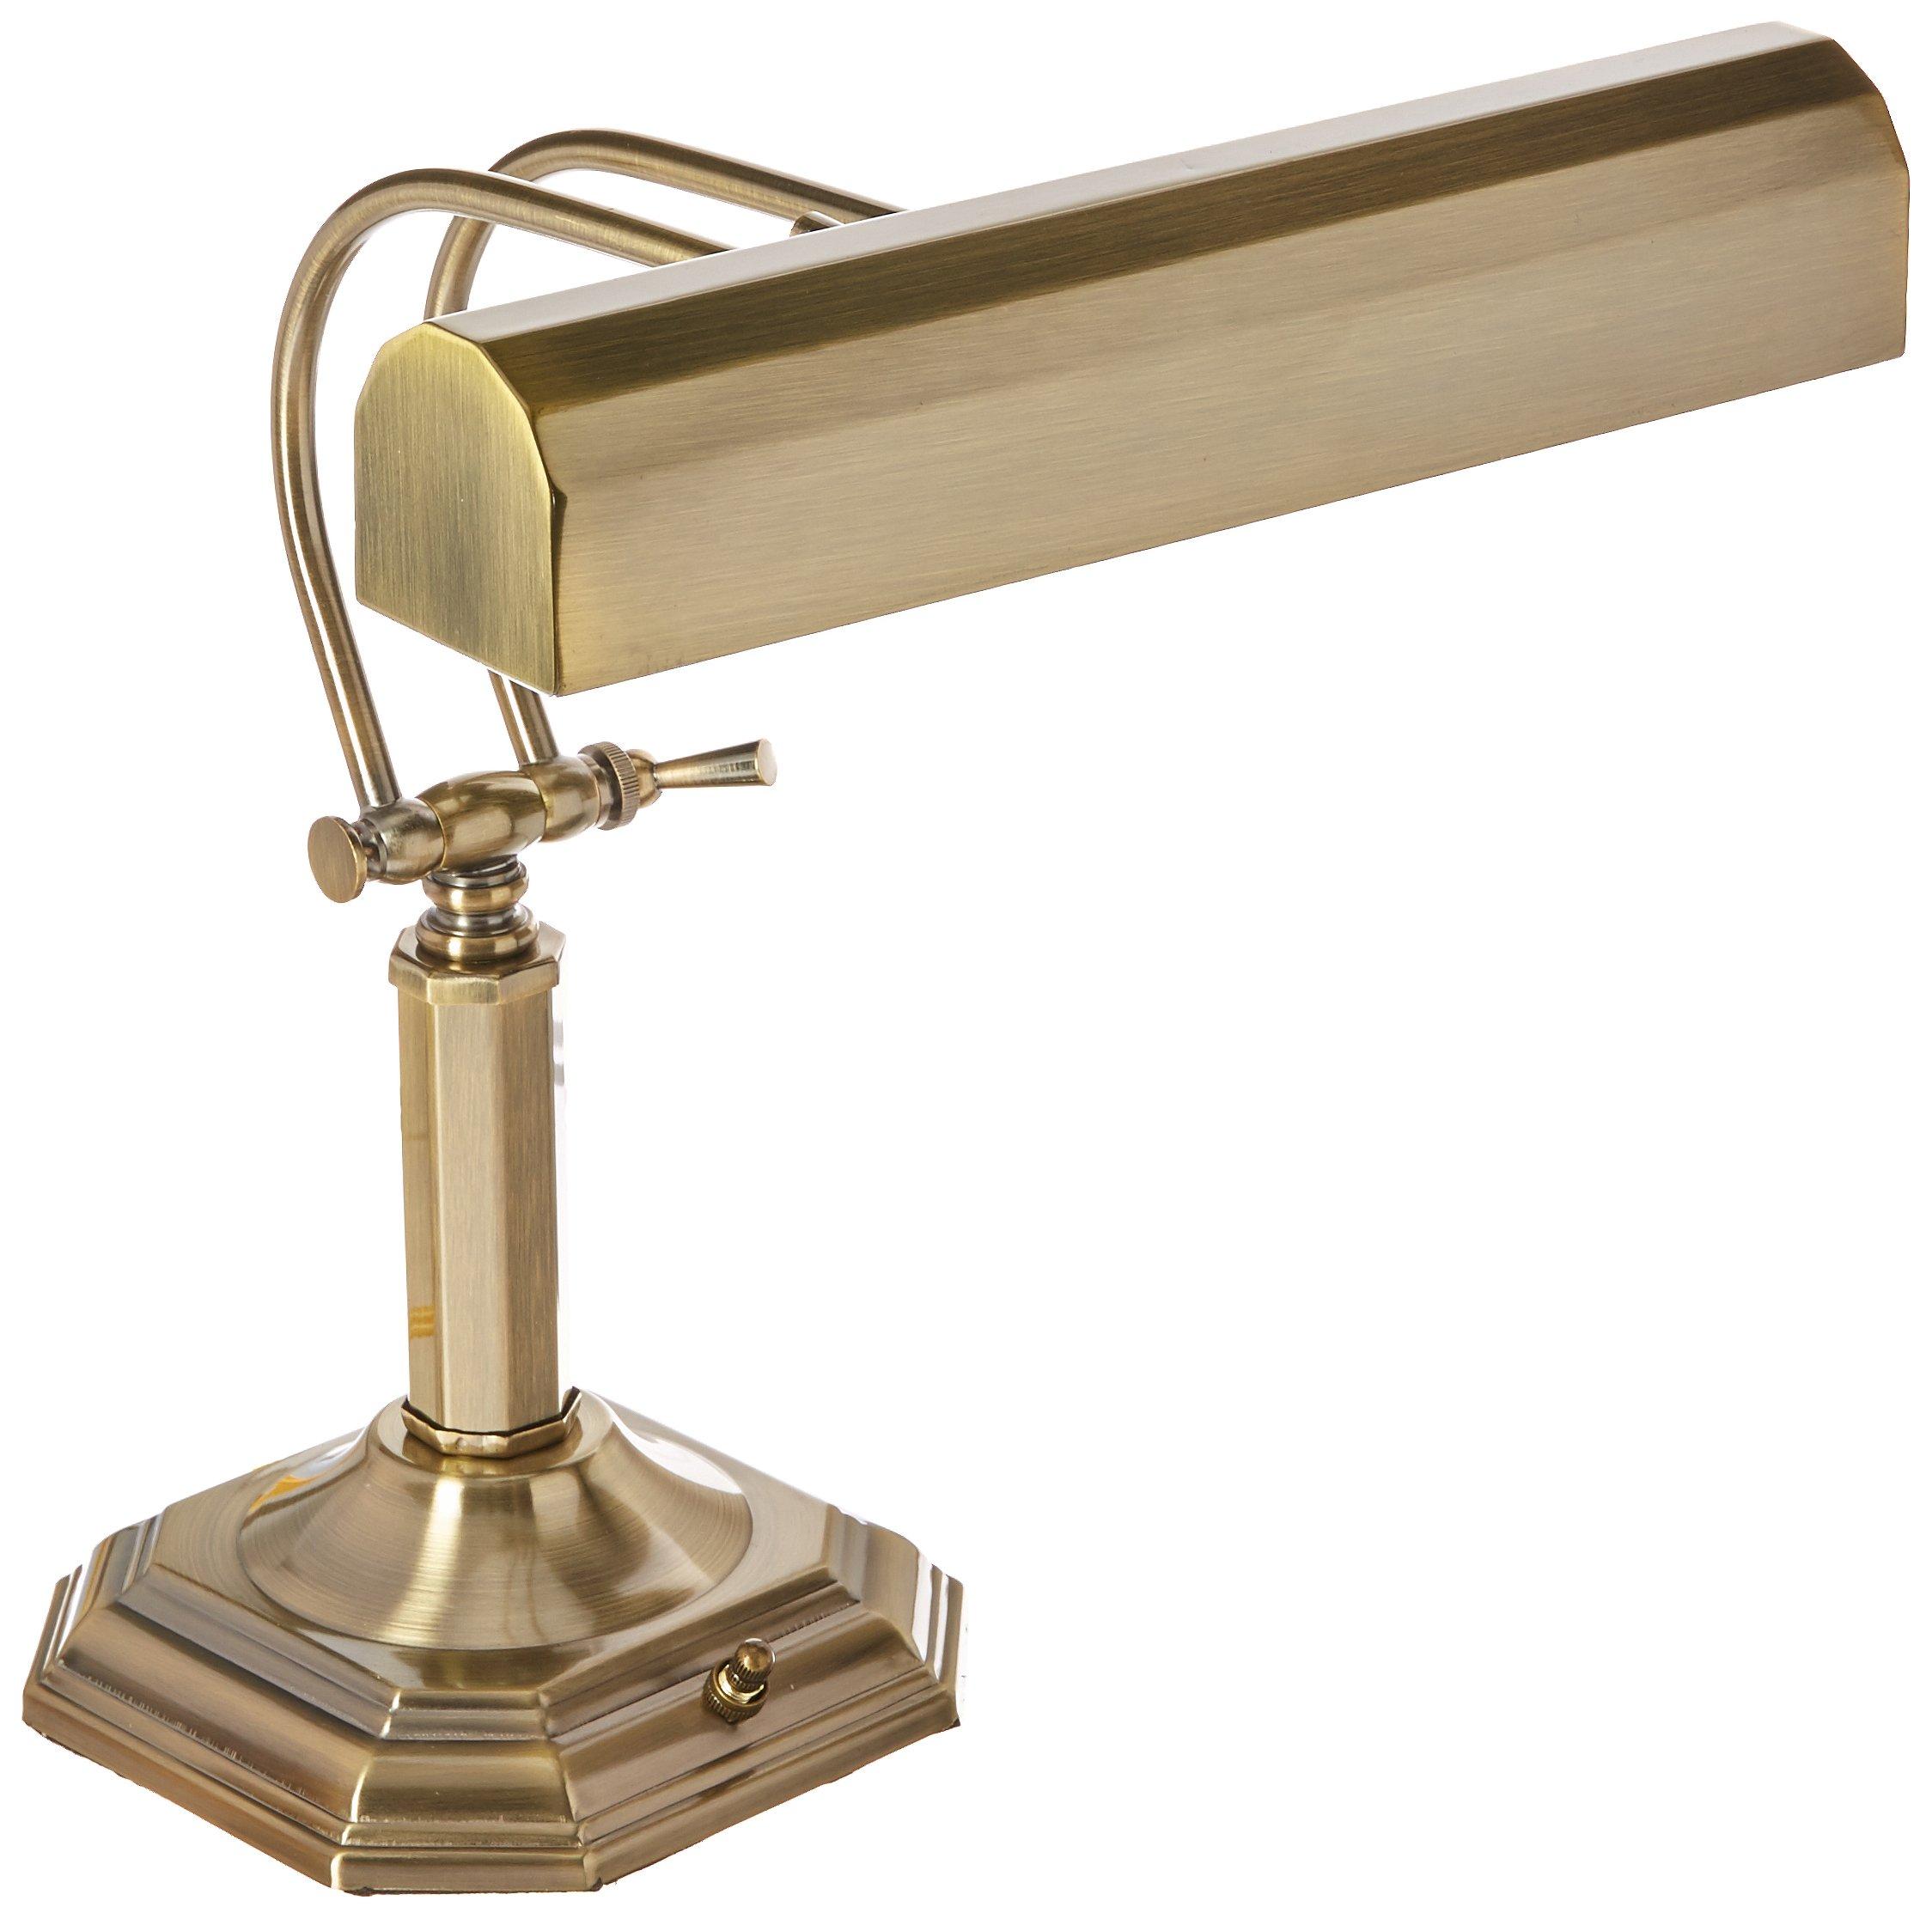 Lite Source Piano Mate Antique Brass Desk Lamp by Lite Source